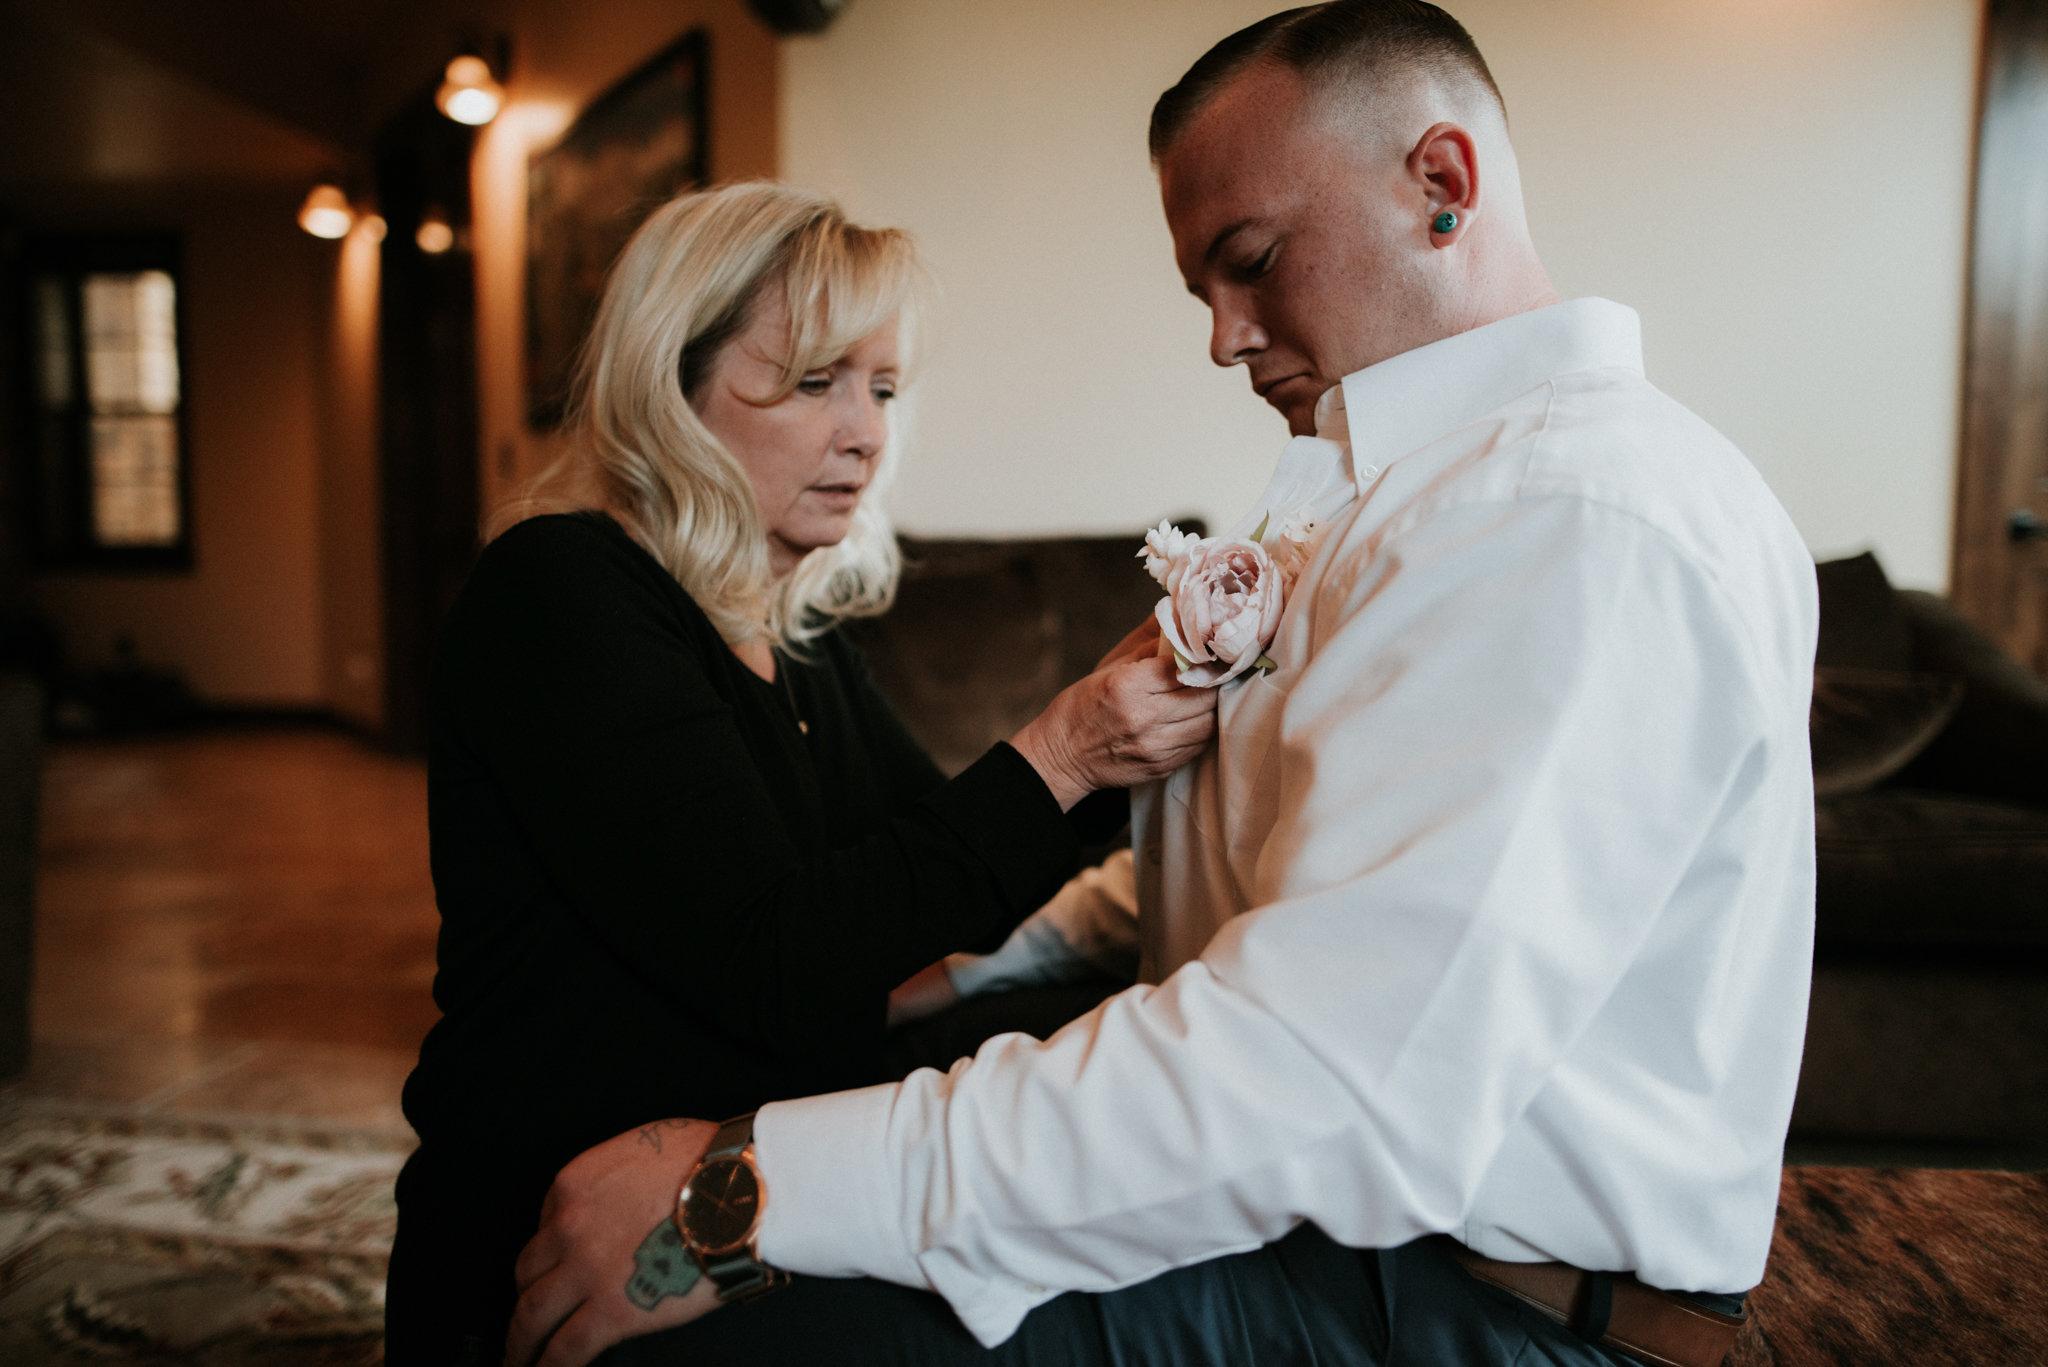 colorado elopement lake dillon sapphire point Zach&Rosalie St. Louis Wedding Photographer--8.jpg